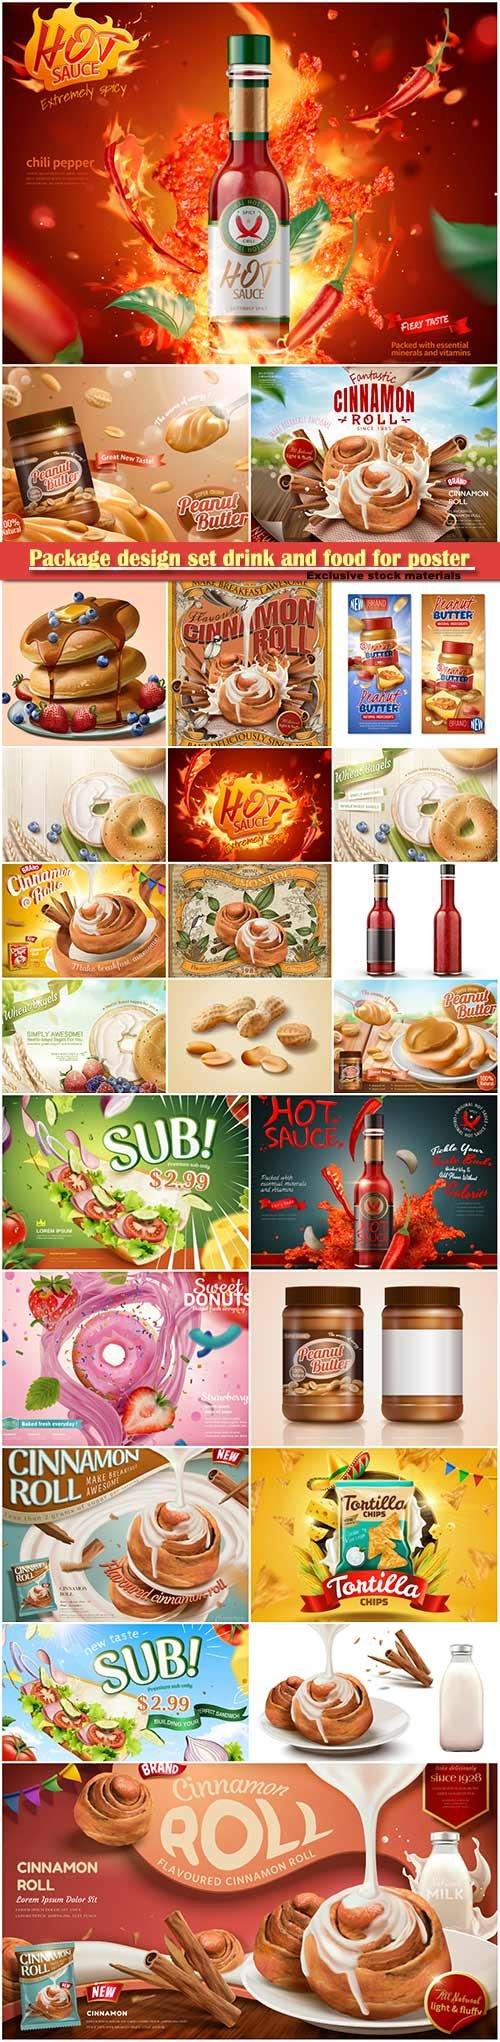 Package design set drink and food for poster or banner, realistic mockup vector 3d illustration